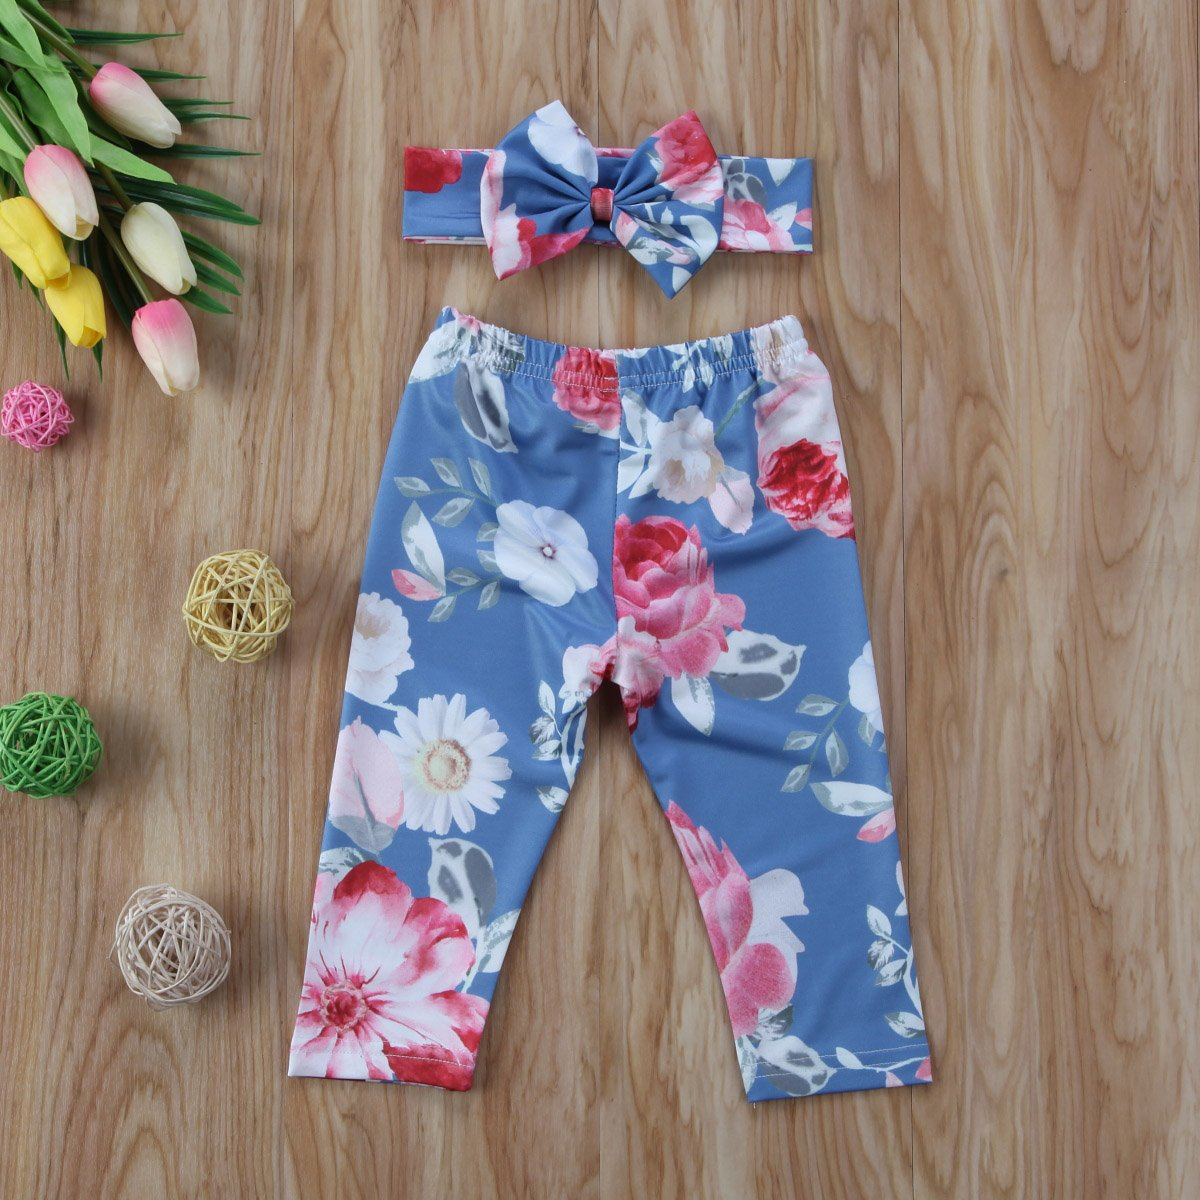 76d369ec30061 Amazon.com: Newborn Baby Girl Floral Long Pants Leggings Headband 2pcs  Outfit Set: Clothing